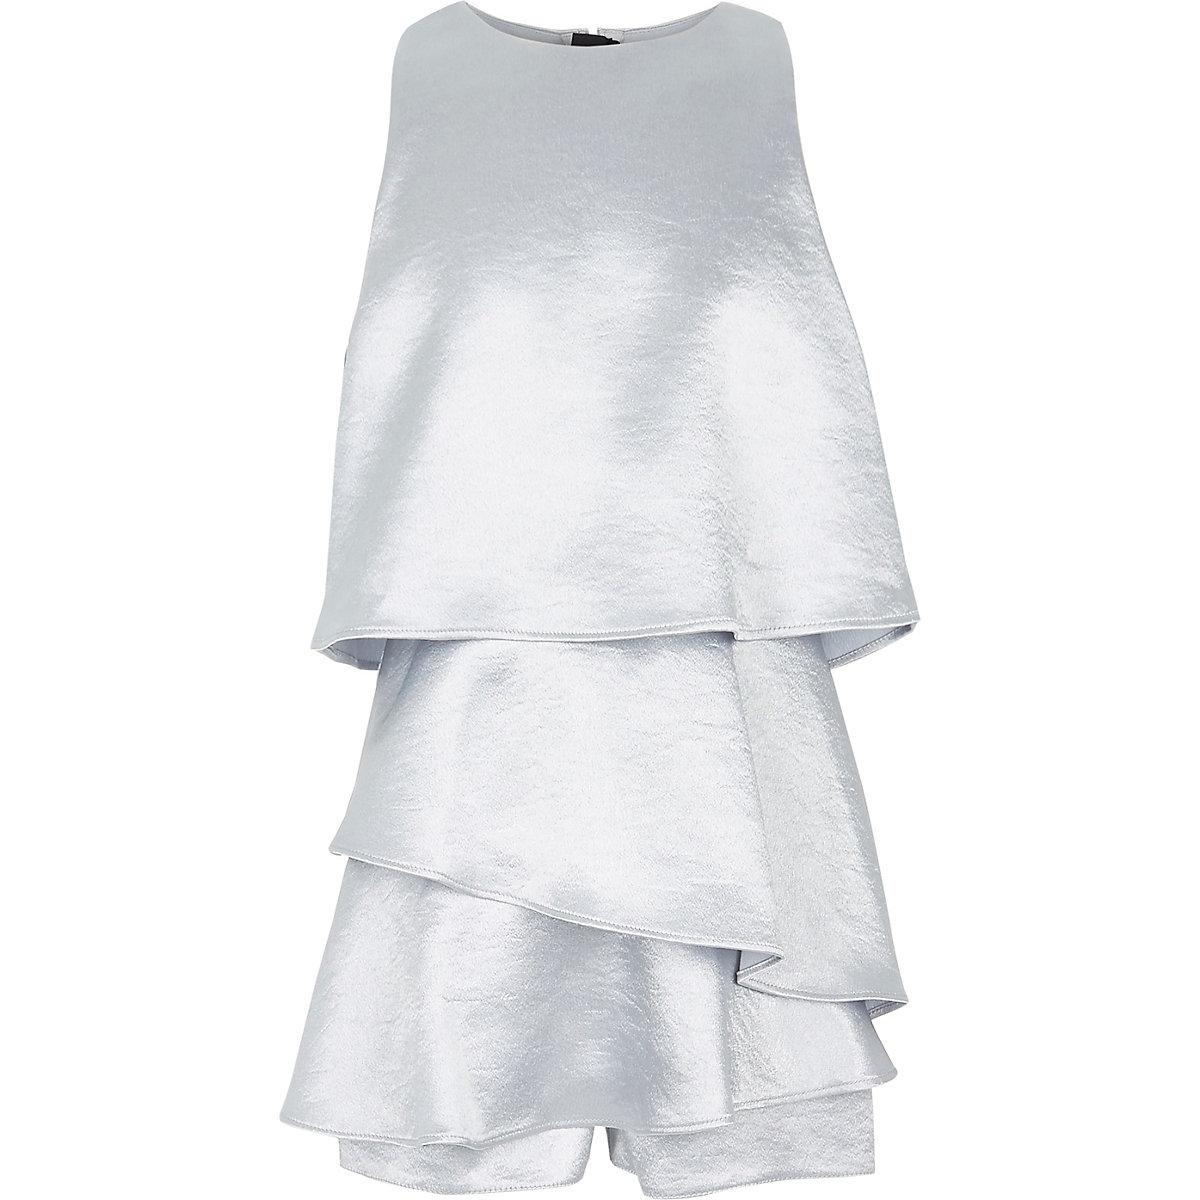 Girls silver skort playsuit